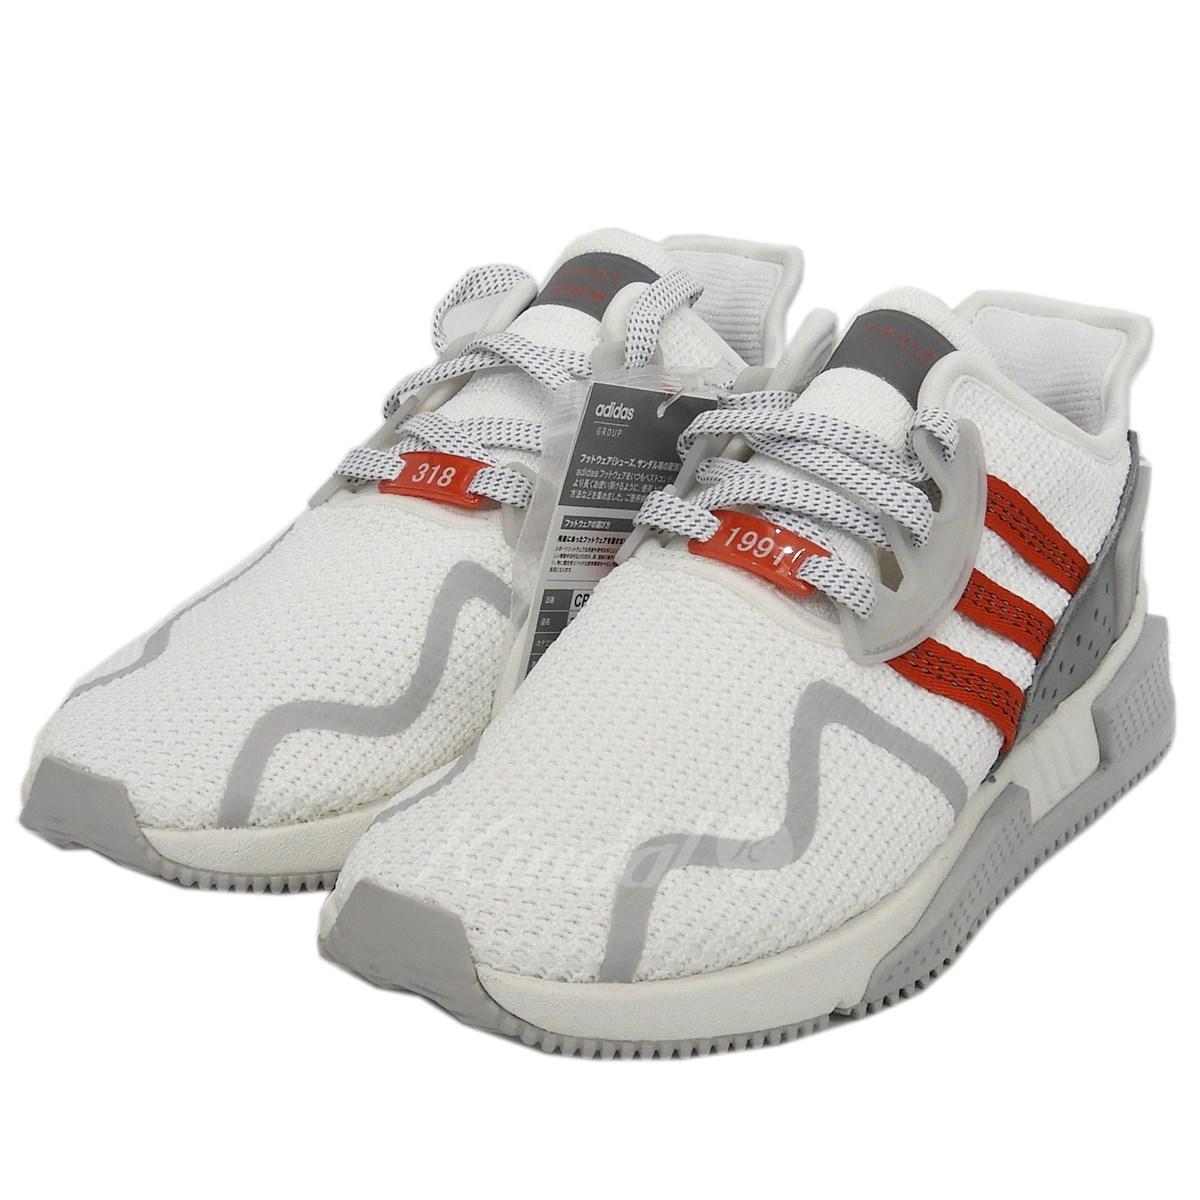 newest collection 69f96 280d3 adidas Asia region limitation